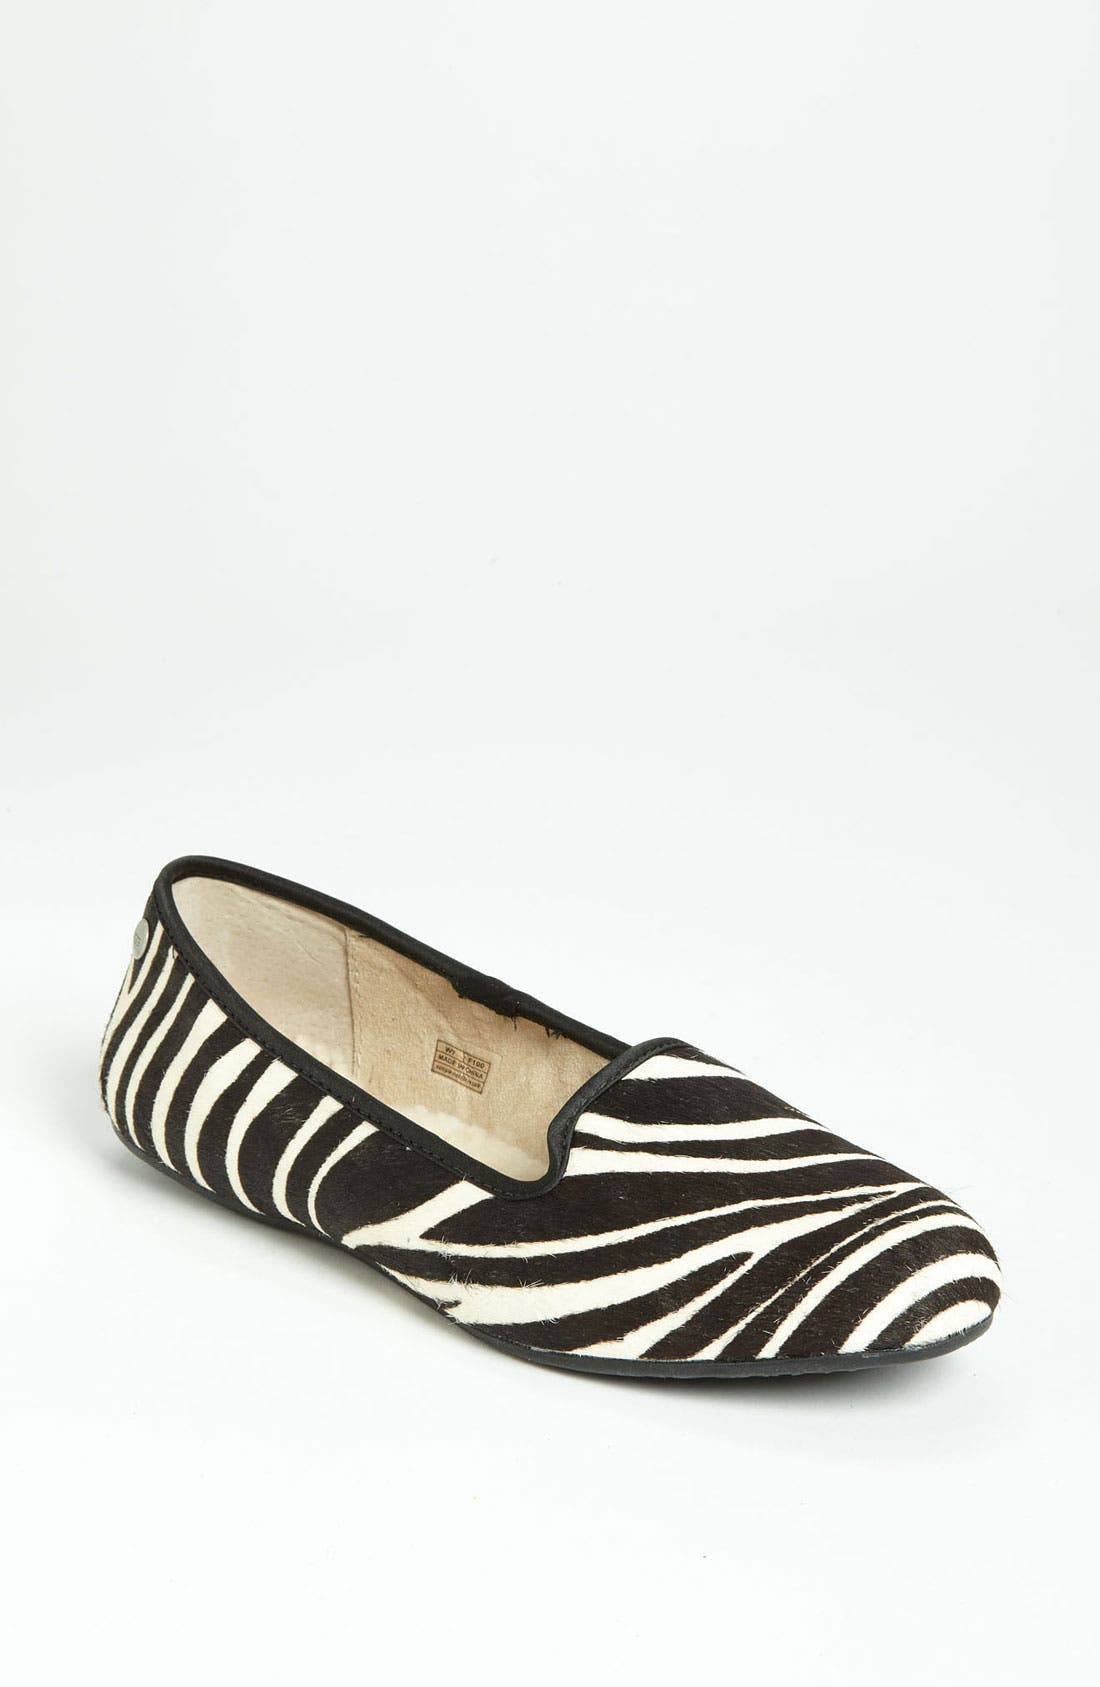 Main Image - UGG® Australia 'Alloway Exotic' Slipper (Women)